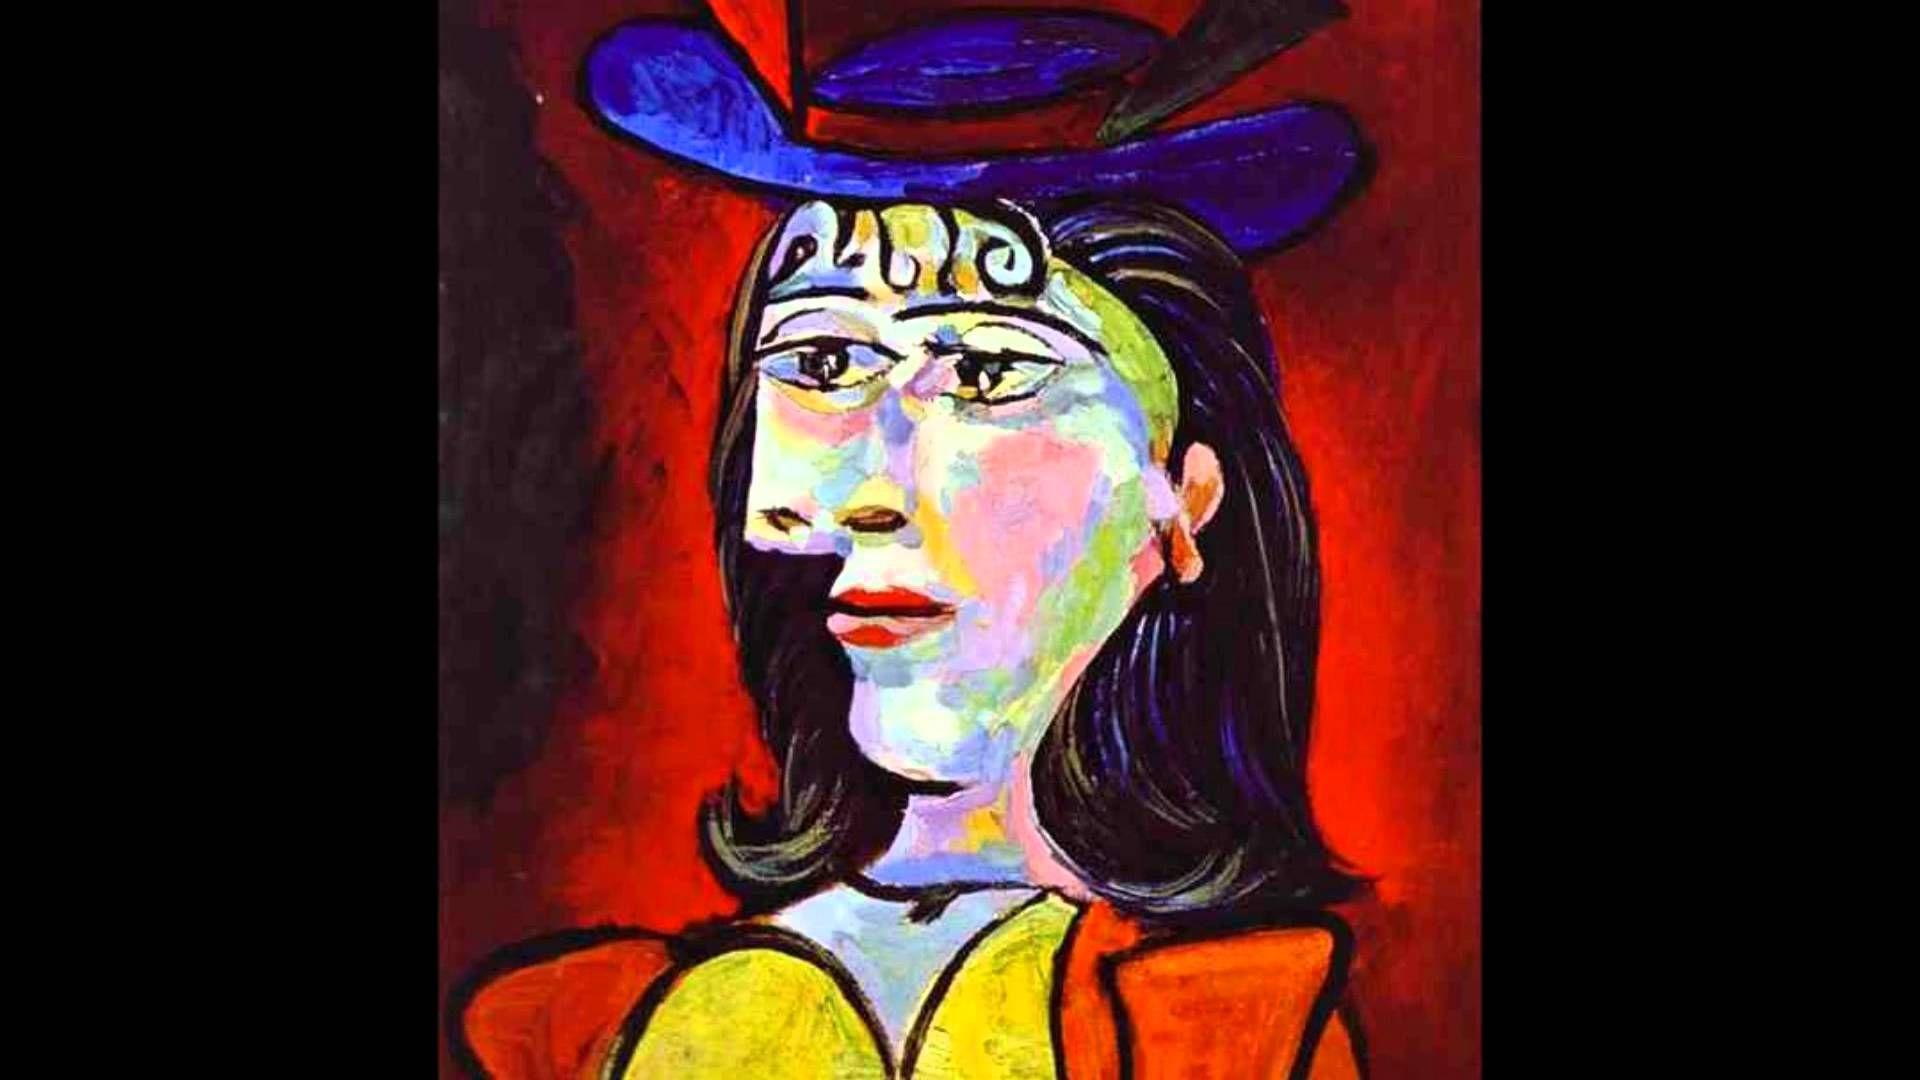 Pablo Picasso   Art picasso, Picasso, Les arts